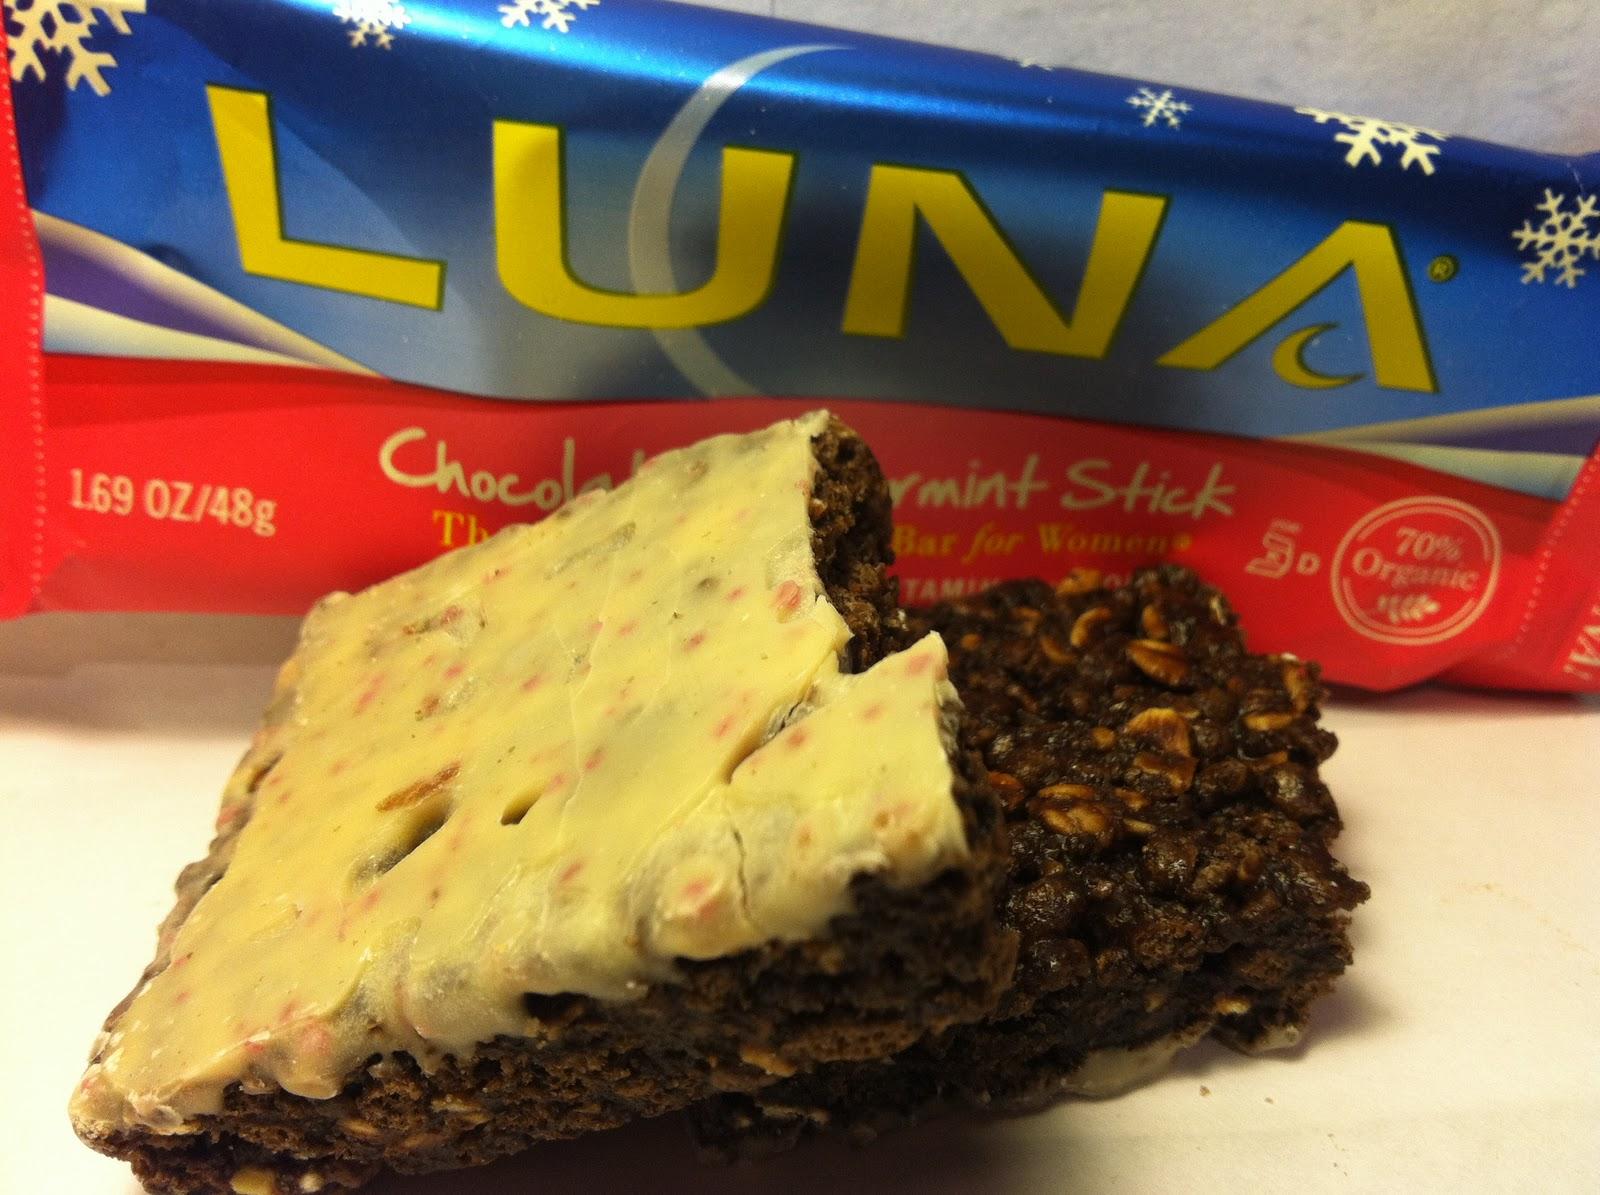 Luna Bar Chocolate Peppermint Stick Calories